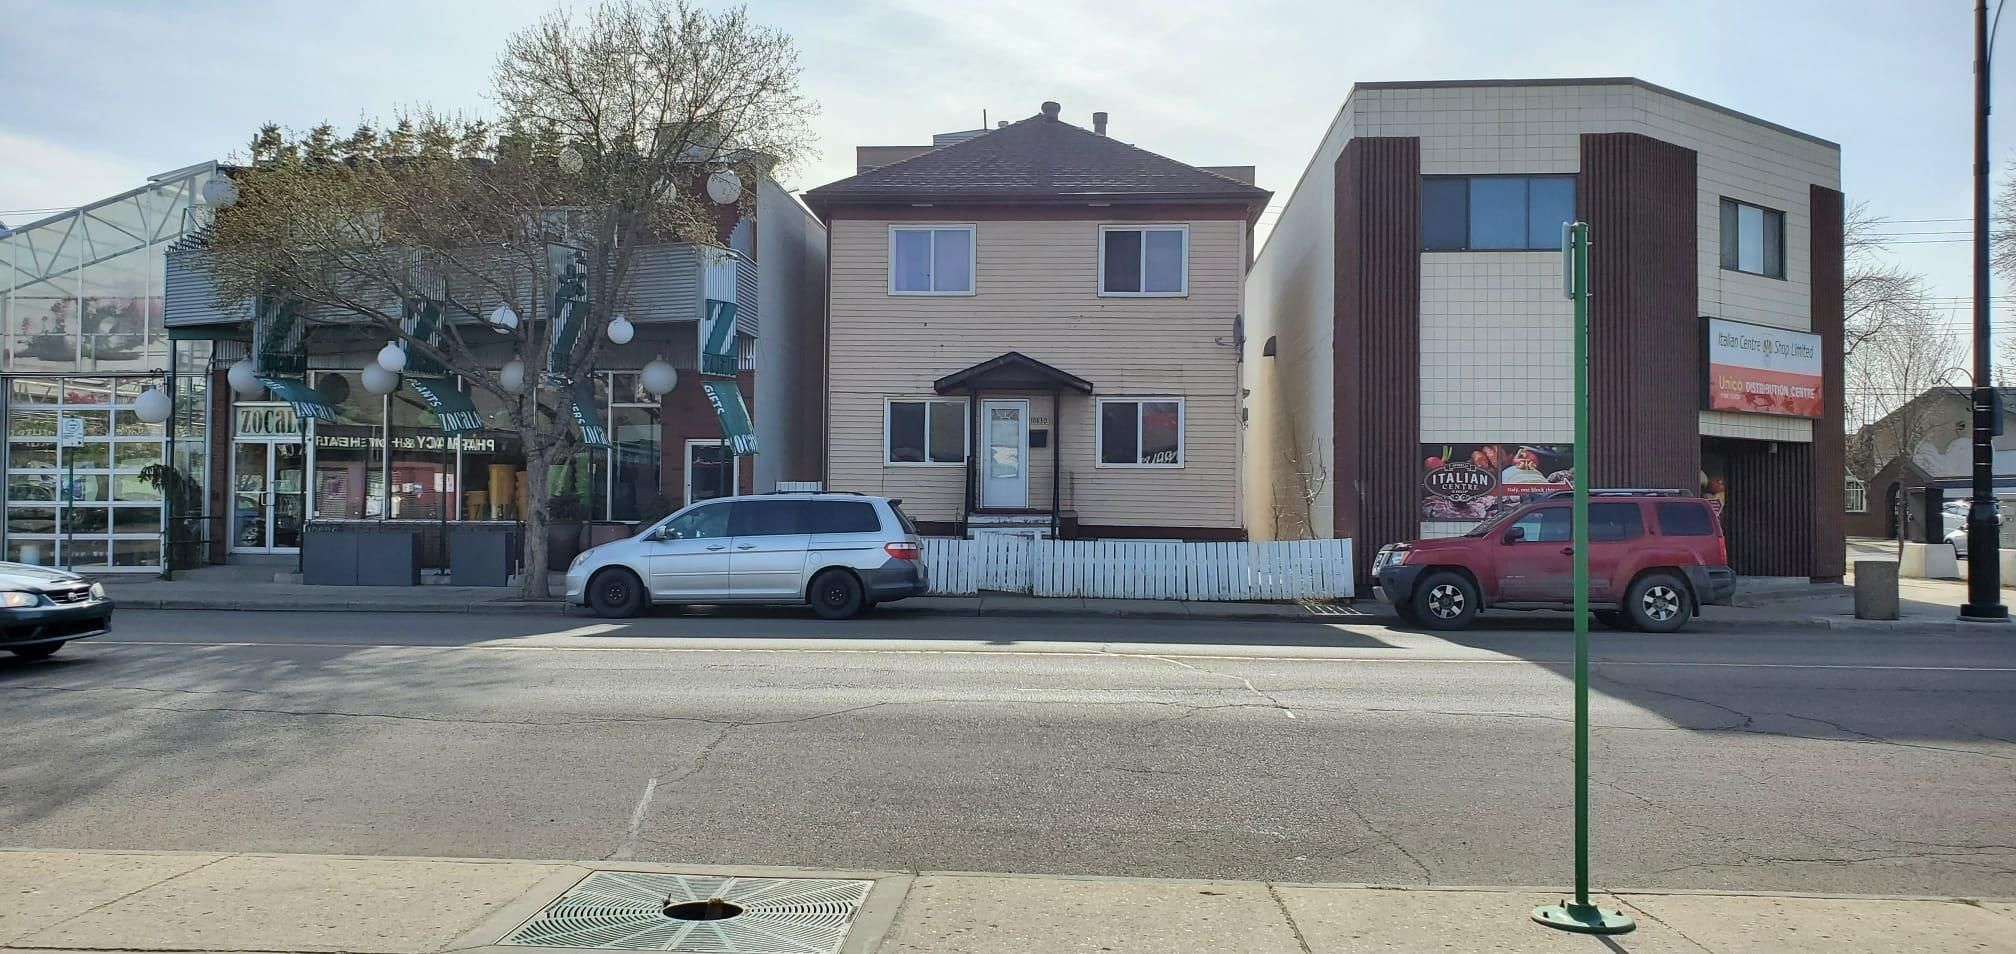 Main Photo: 10830 95 Street in Edmonton: Zone 13 Multi-Family Commercial for sale : MLS®# E4248292